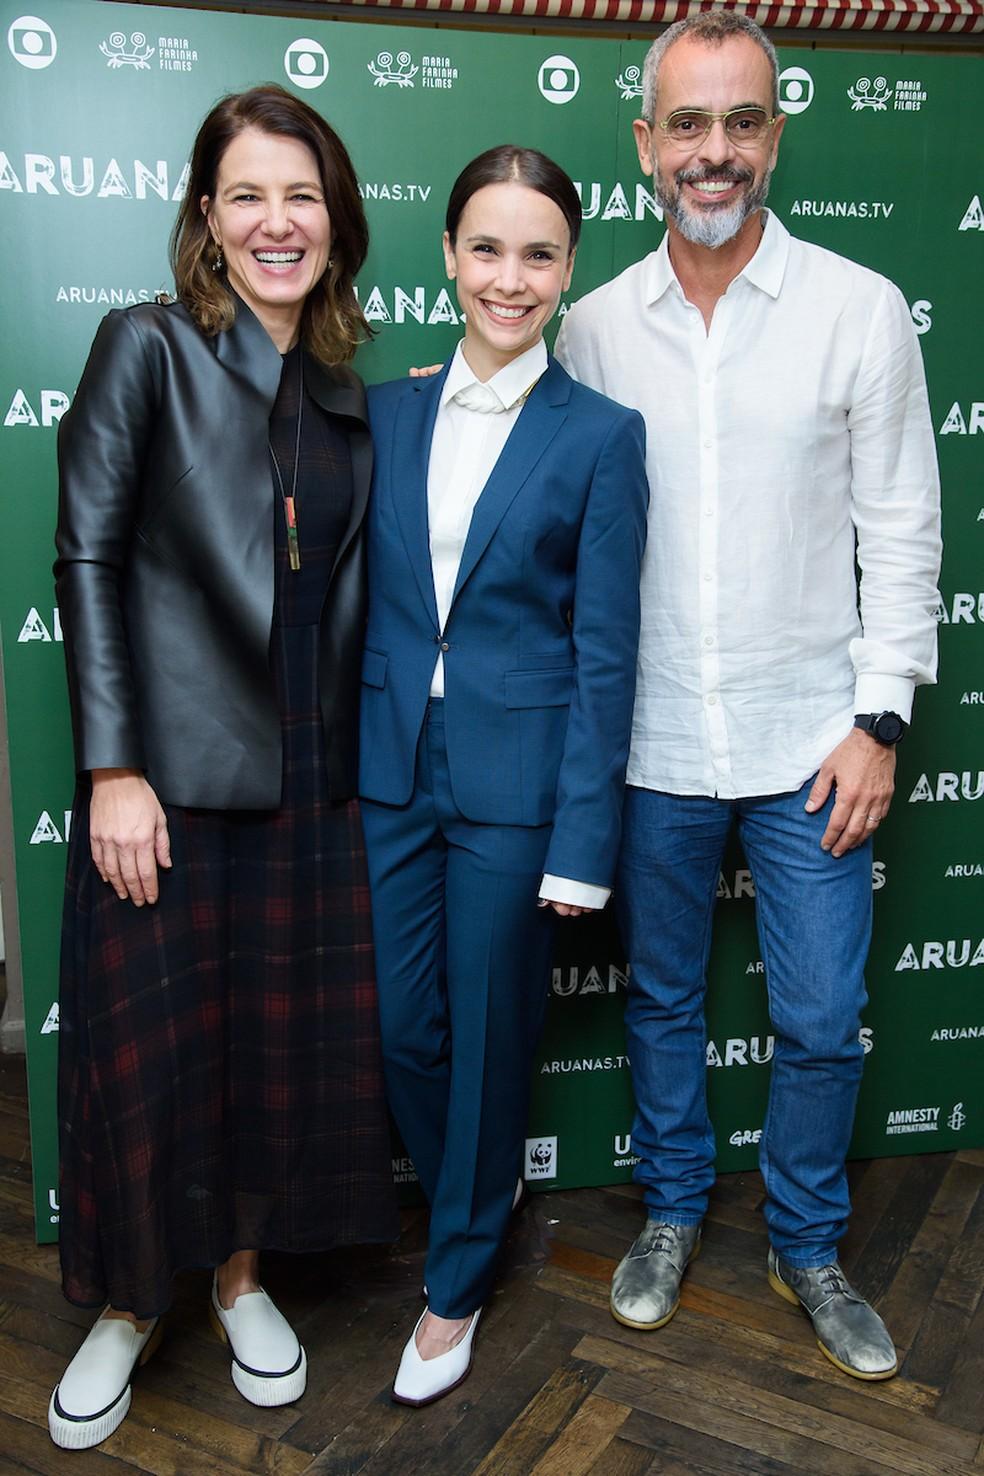 A atriz Débora Falabella entre Estela Renner e Marcos Nisti, autores de 'Aruanas' — Foto: Joanne Davidson/Globo